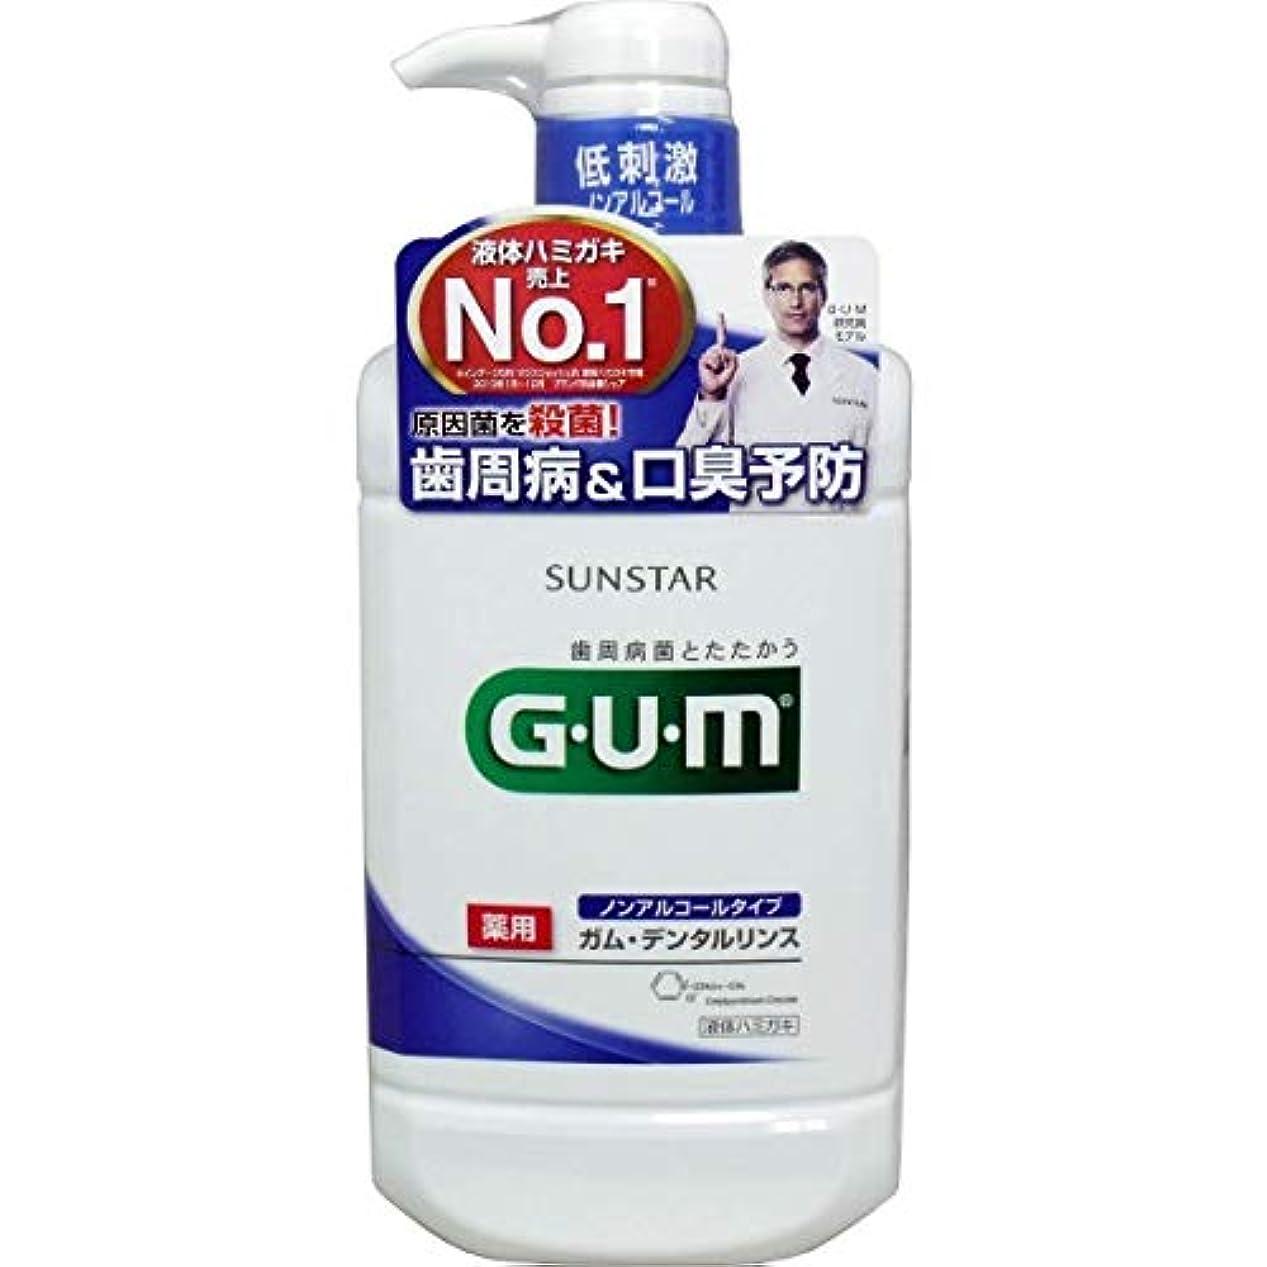 GUM(ガム)?デンタルリンス (ノンアルコールタイプ) 960mL (医薬部外品) × 6点